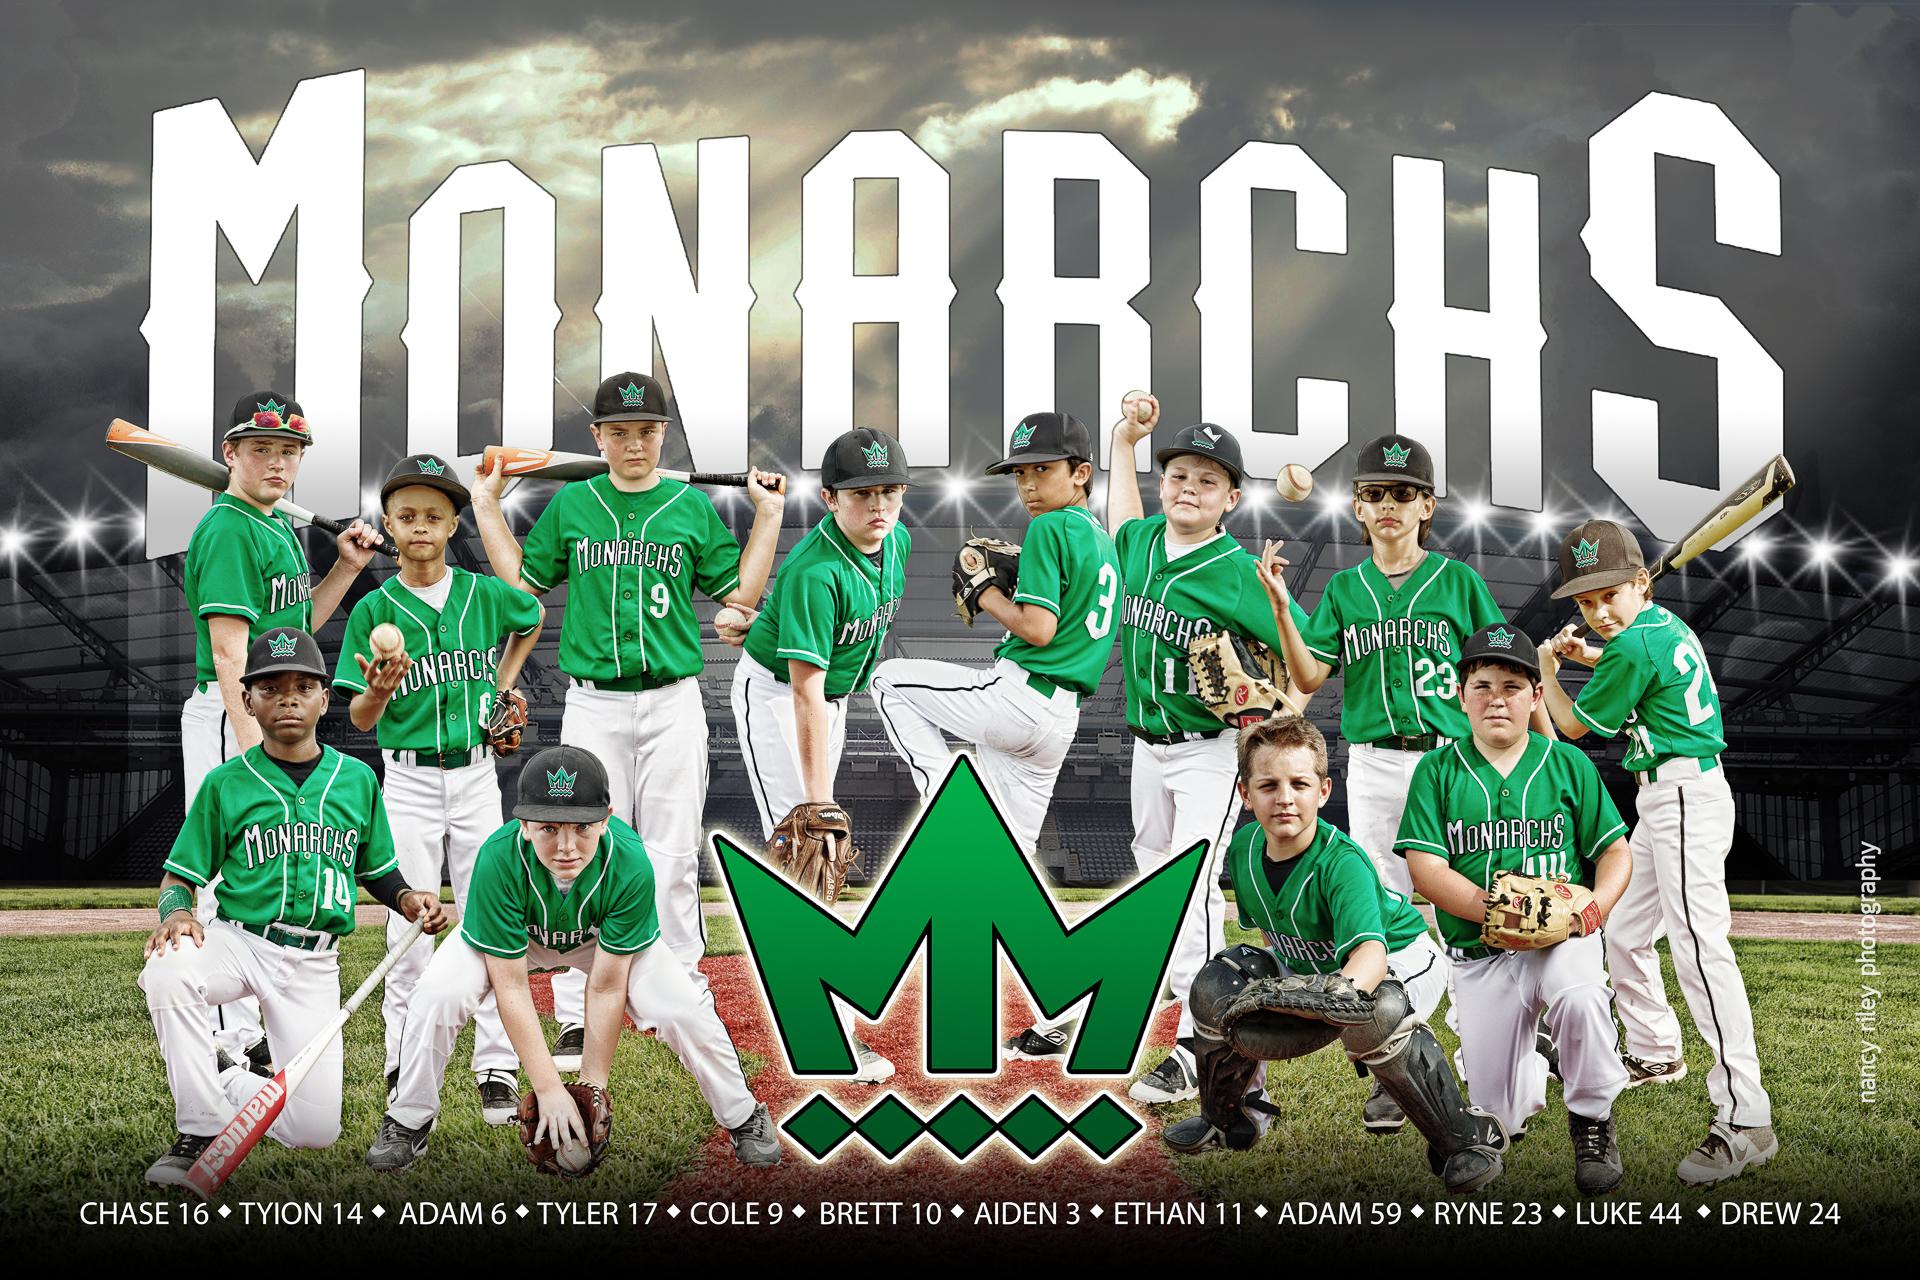 Mason Monarchs baseball team banner